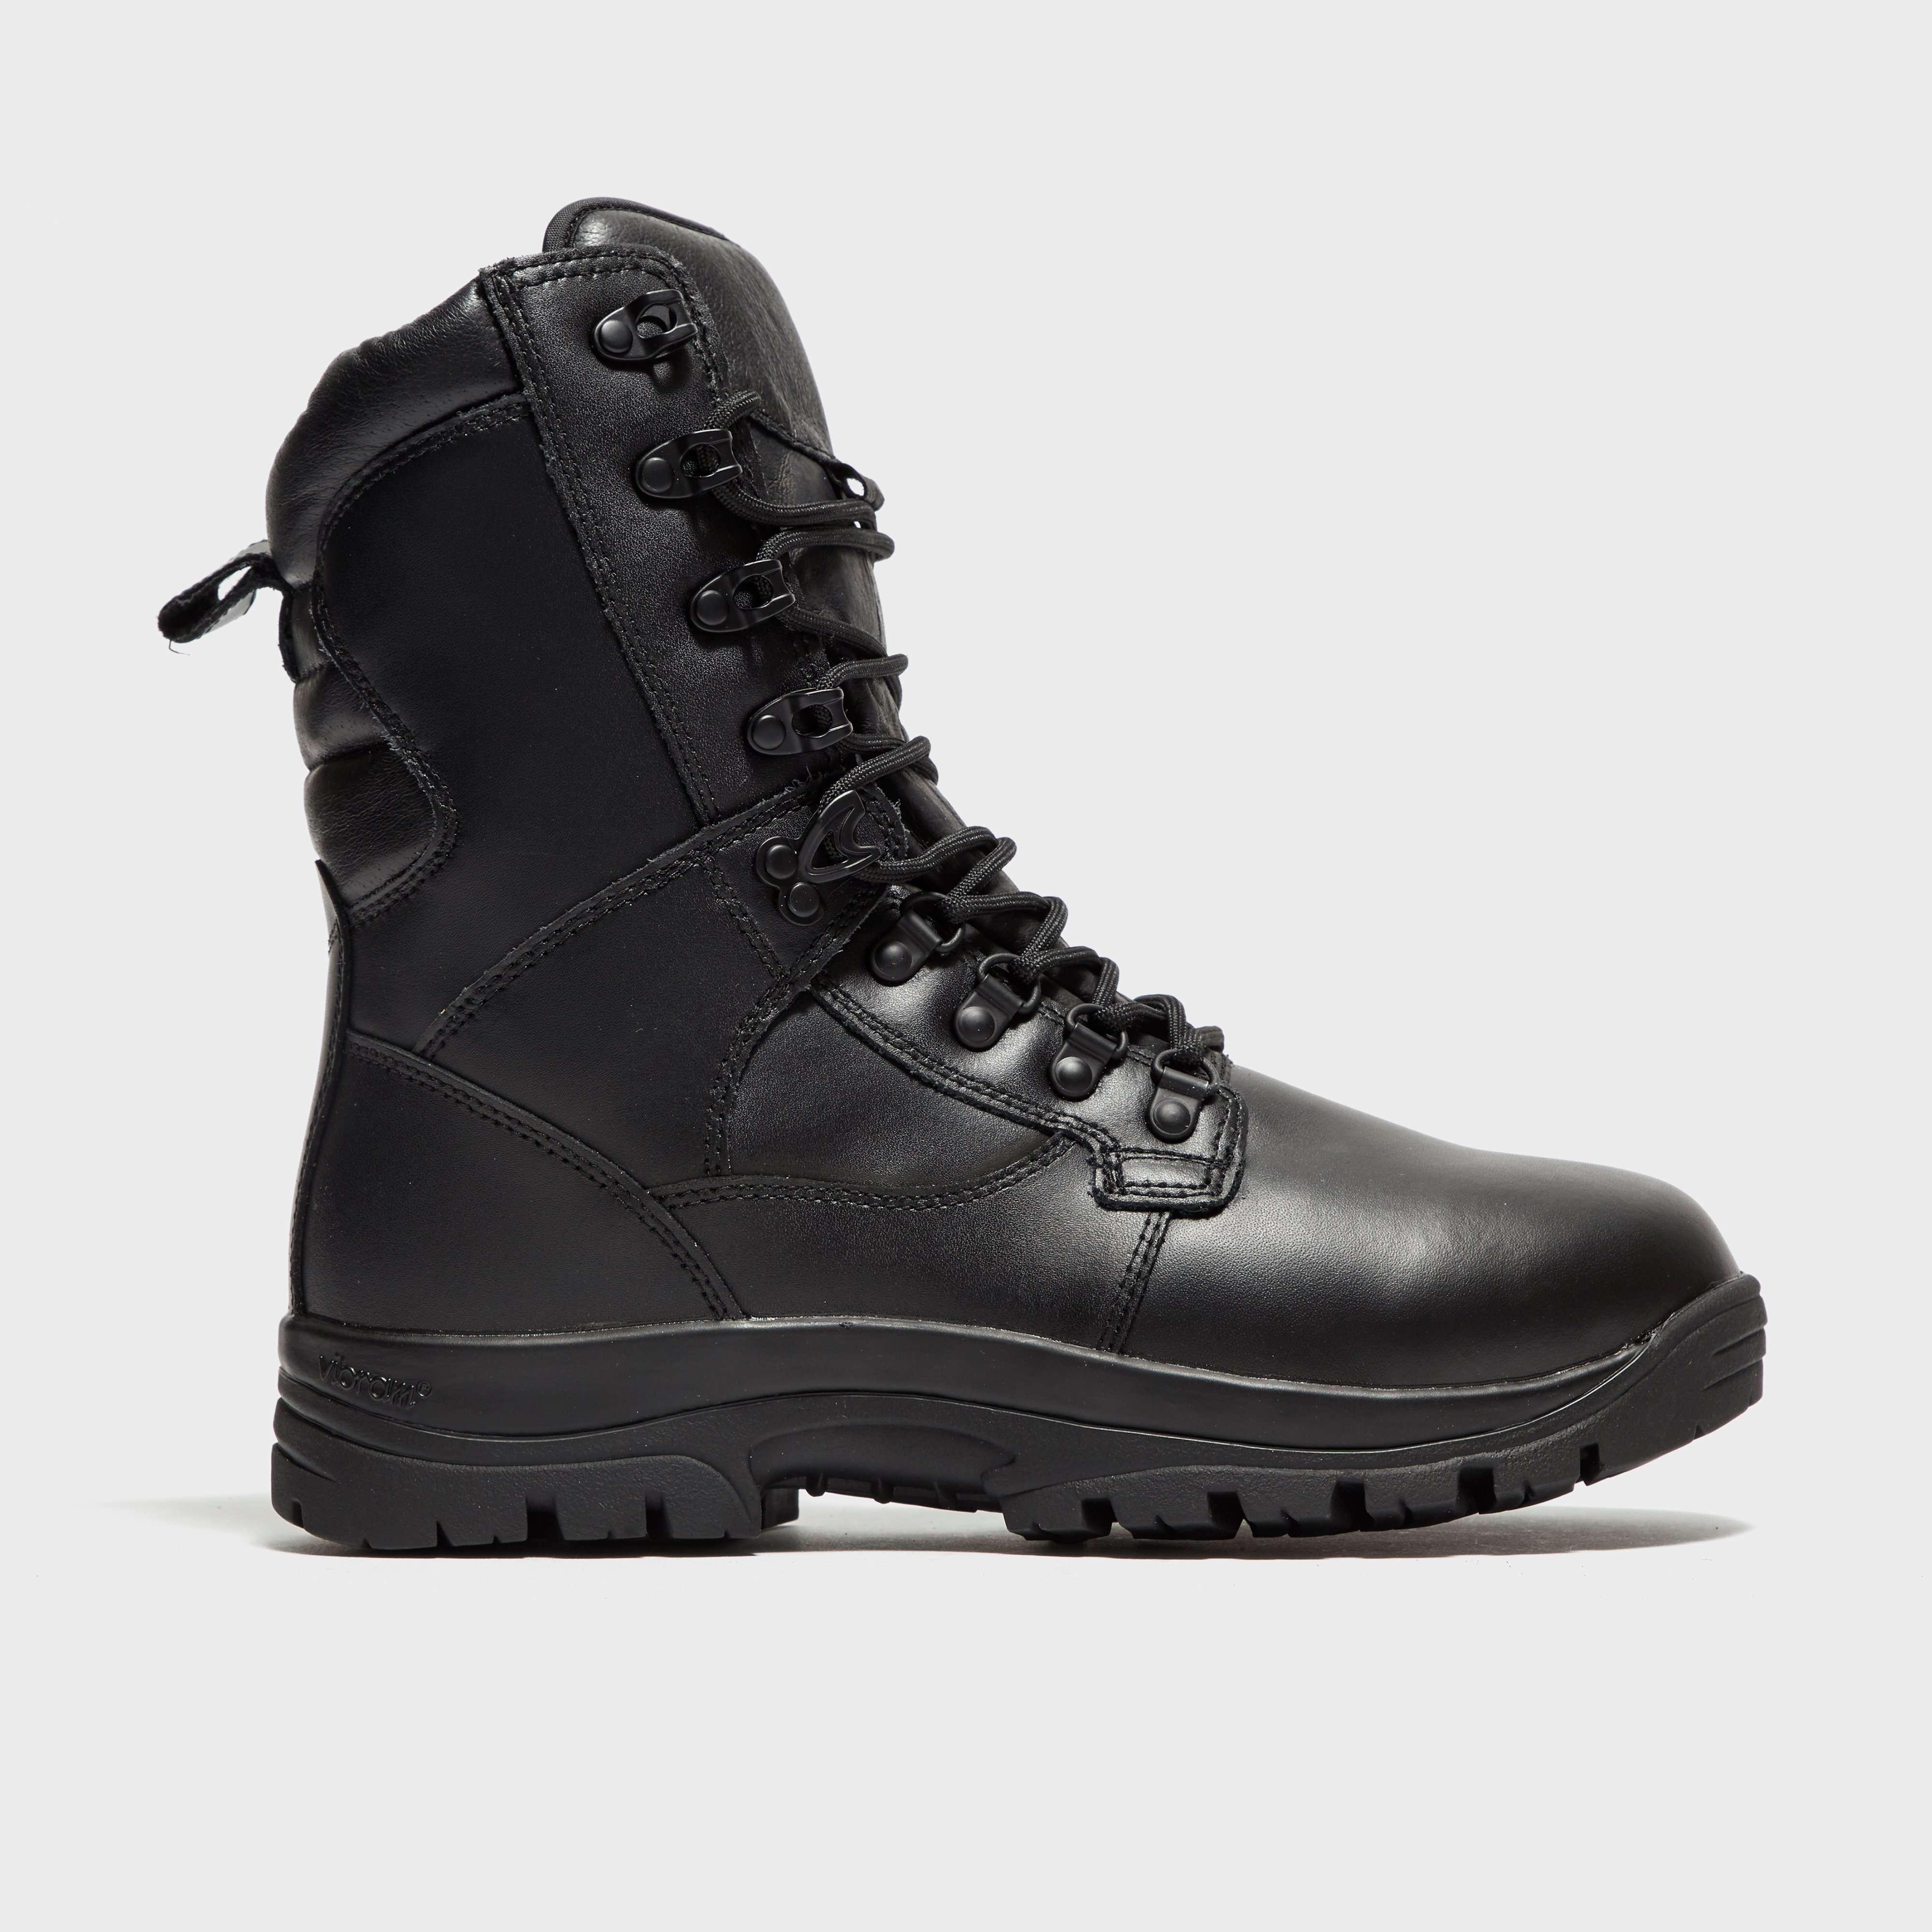 MAGNUM Unisex Elite II Leather Waterproof Boots